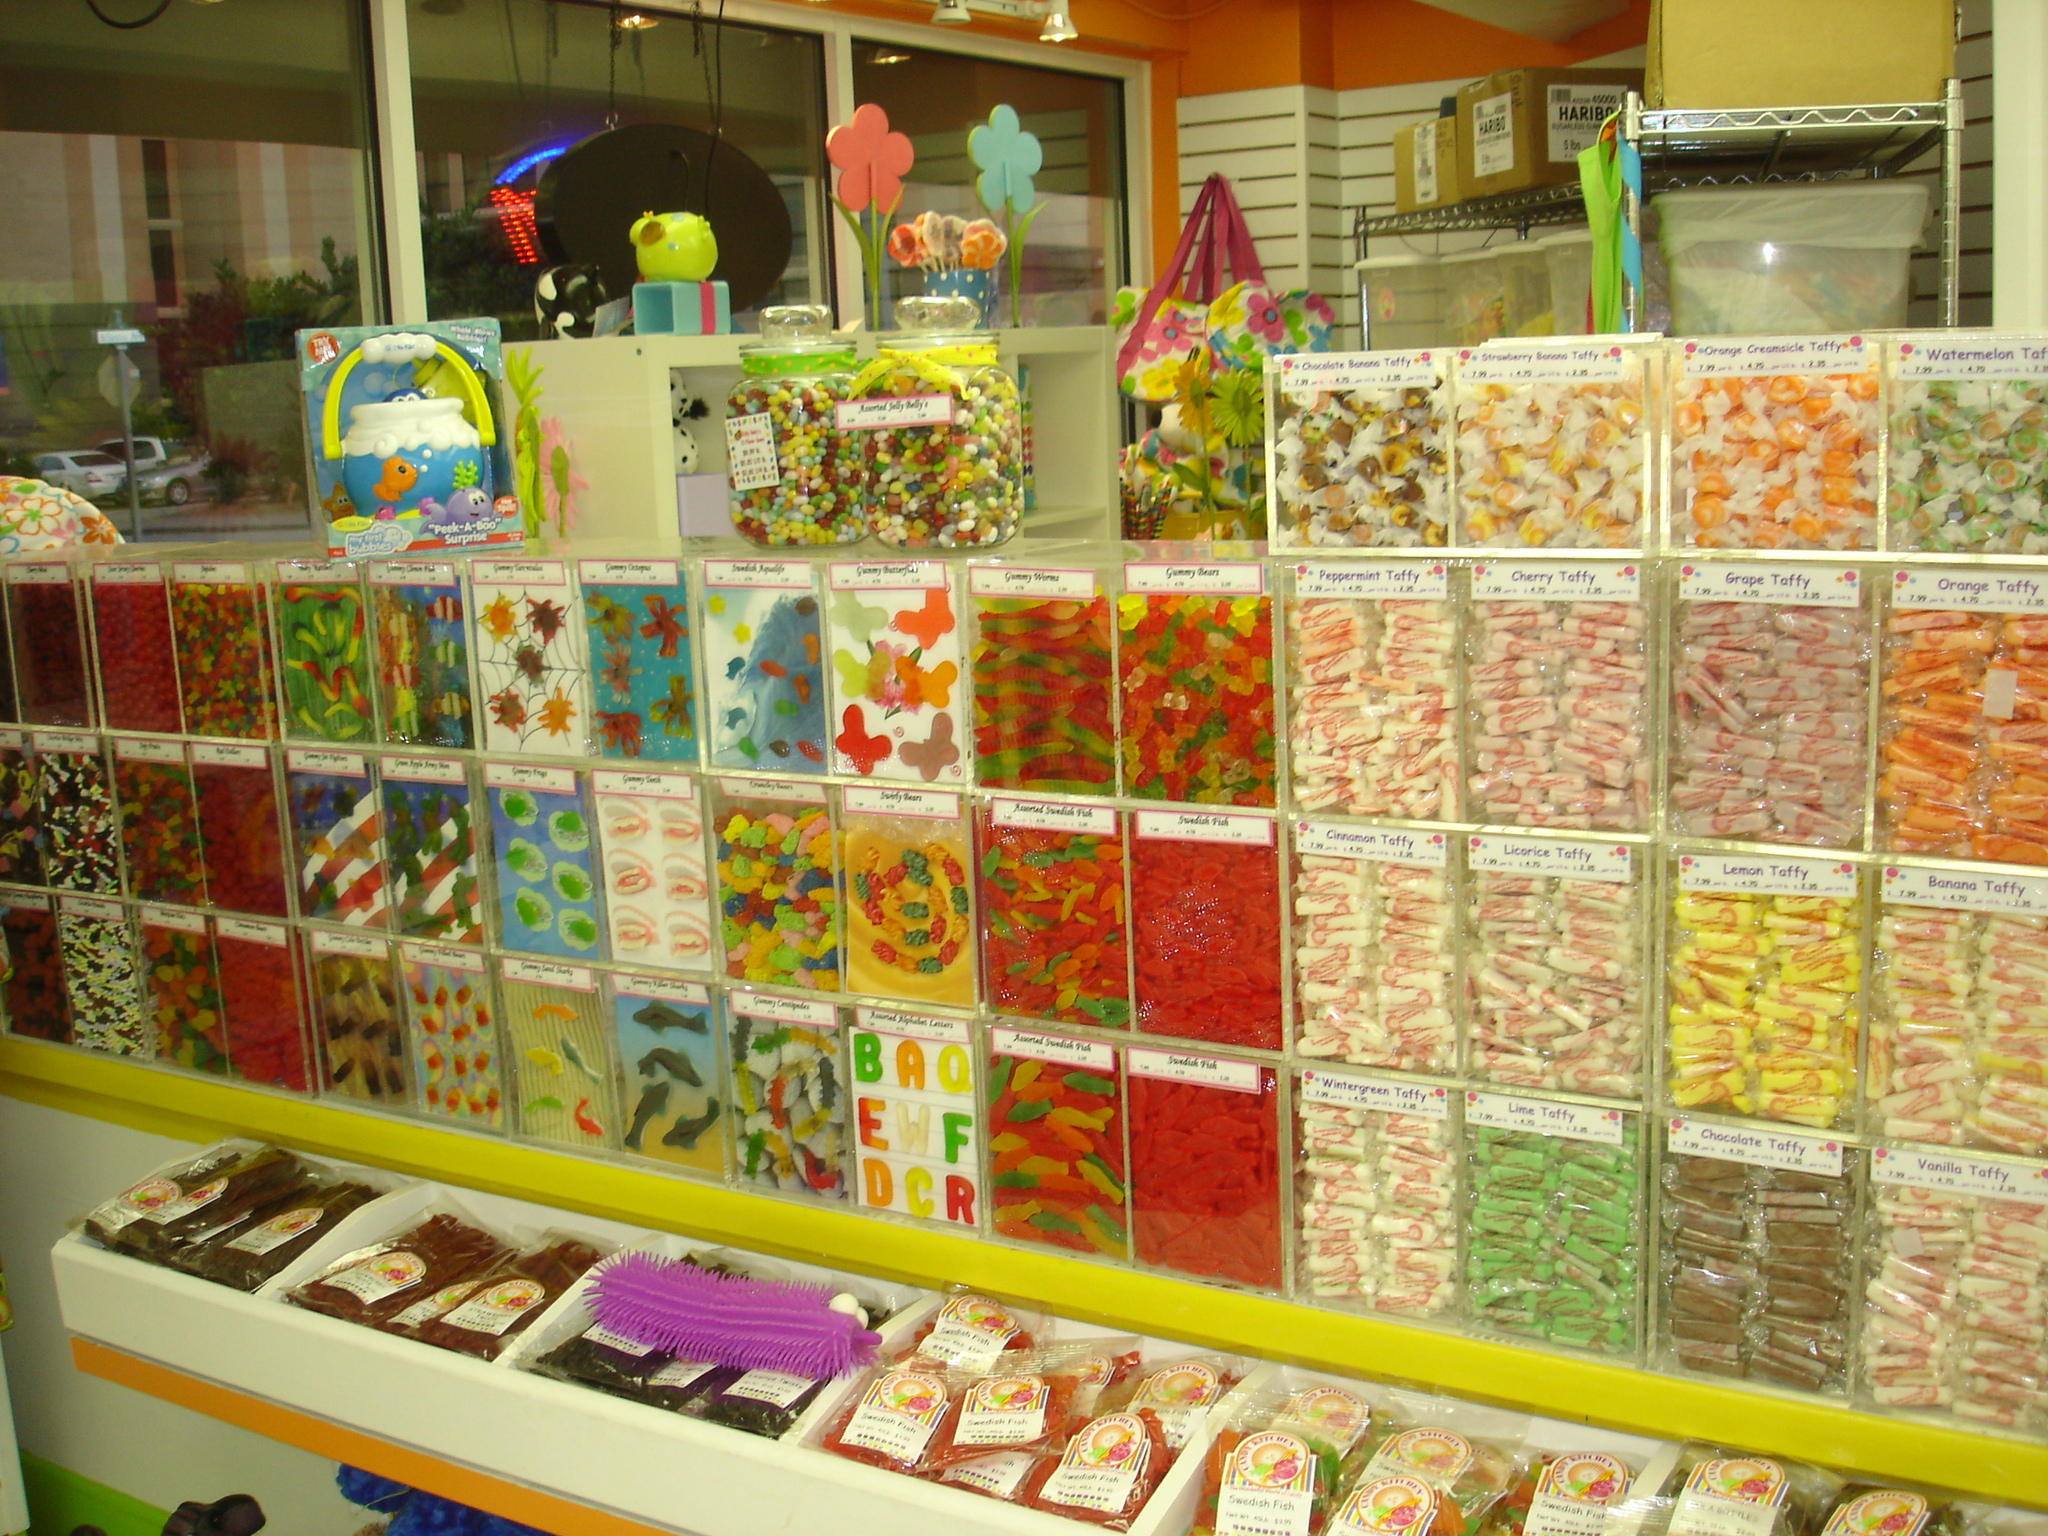 Filecandy Store Candy Kitchen In Virginia Beach Va Usa